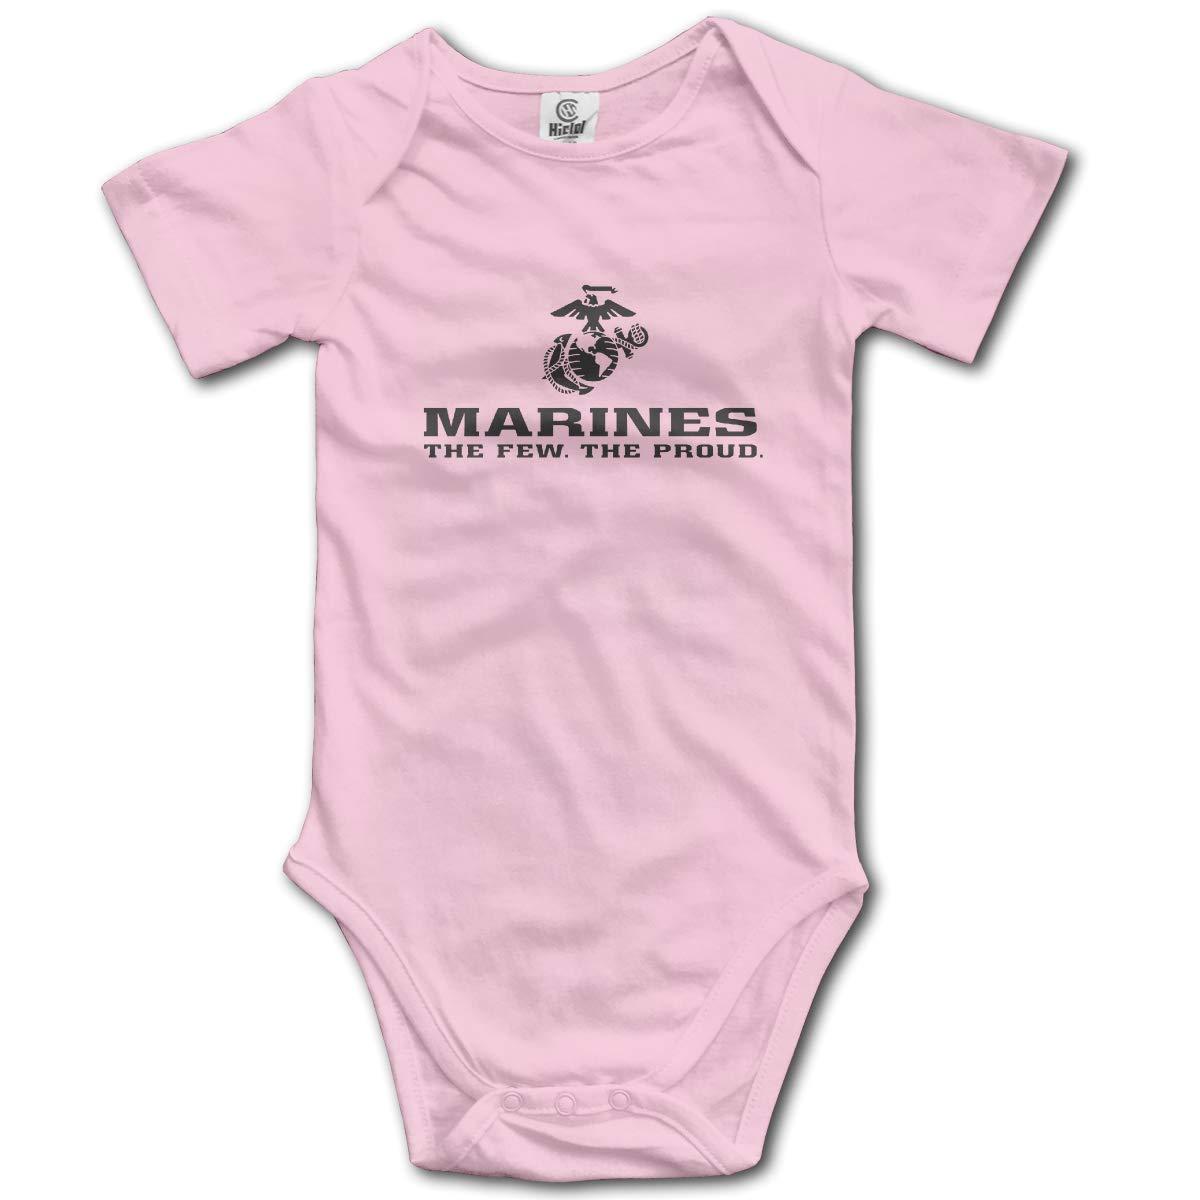 FAFU/&SKY USMC The Few The Proud Marines Corps Newbaby Baby Romper Summer Short Sleeve Onesie